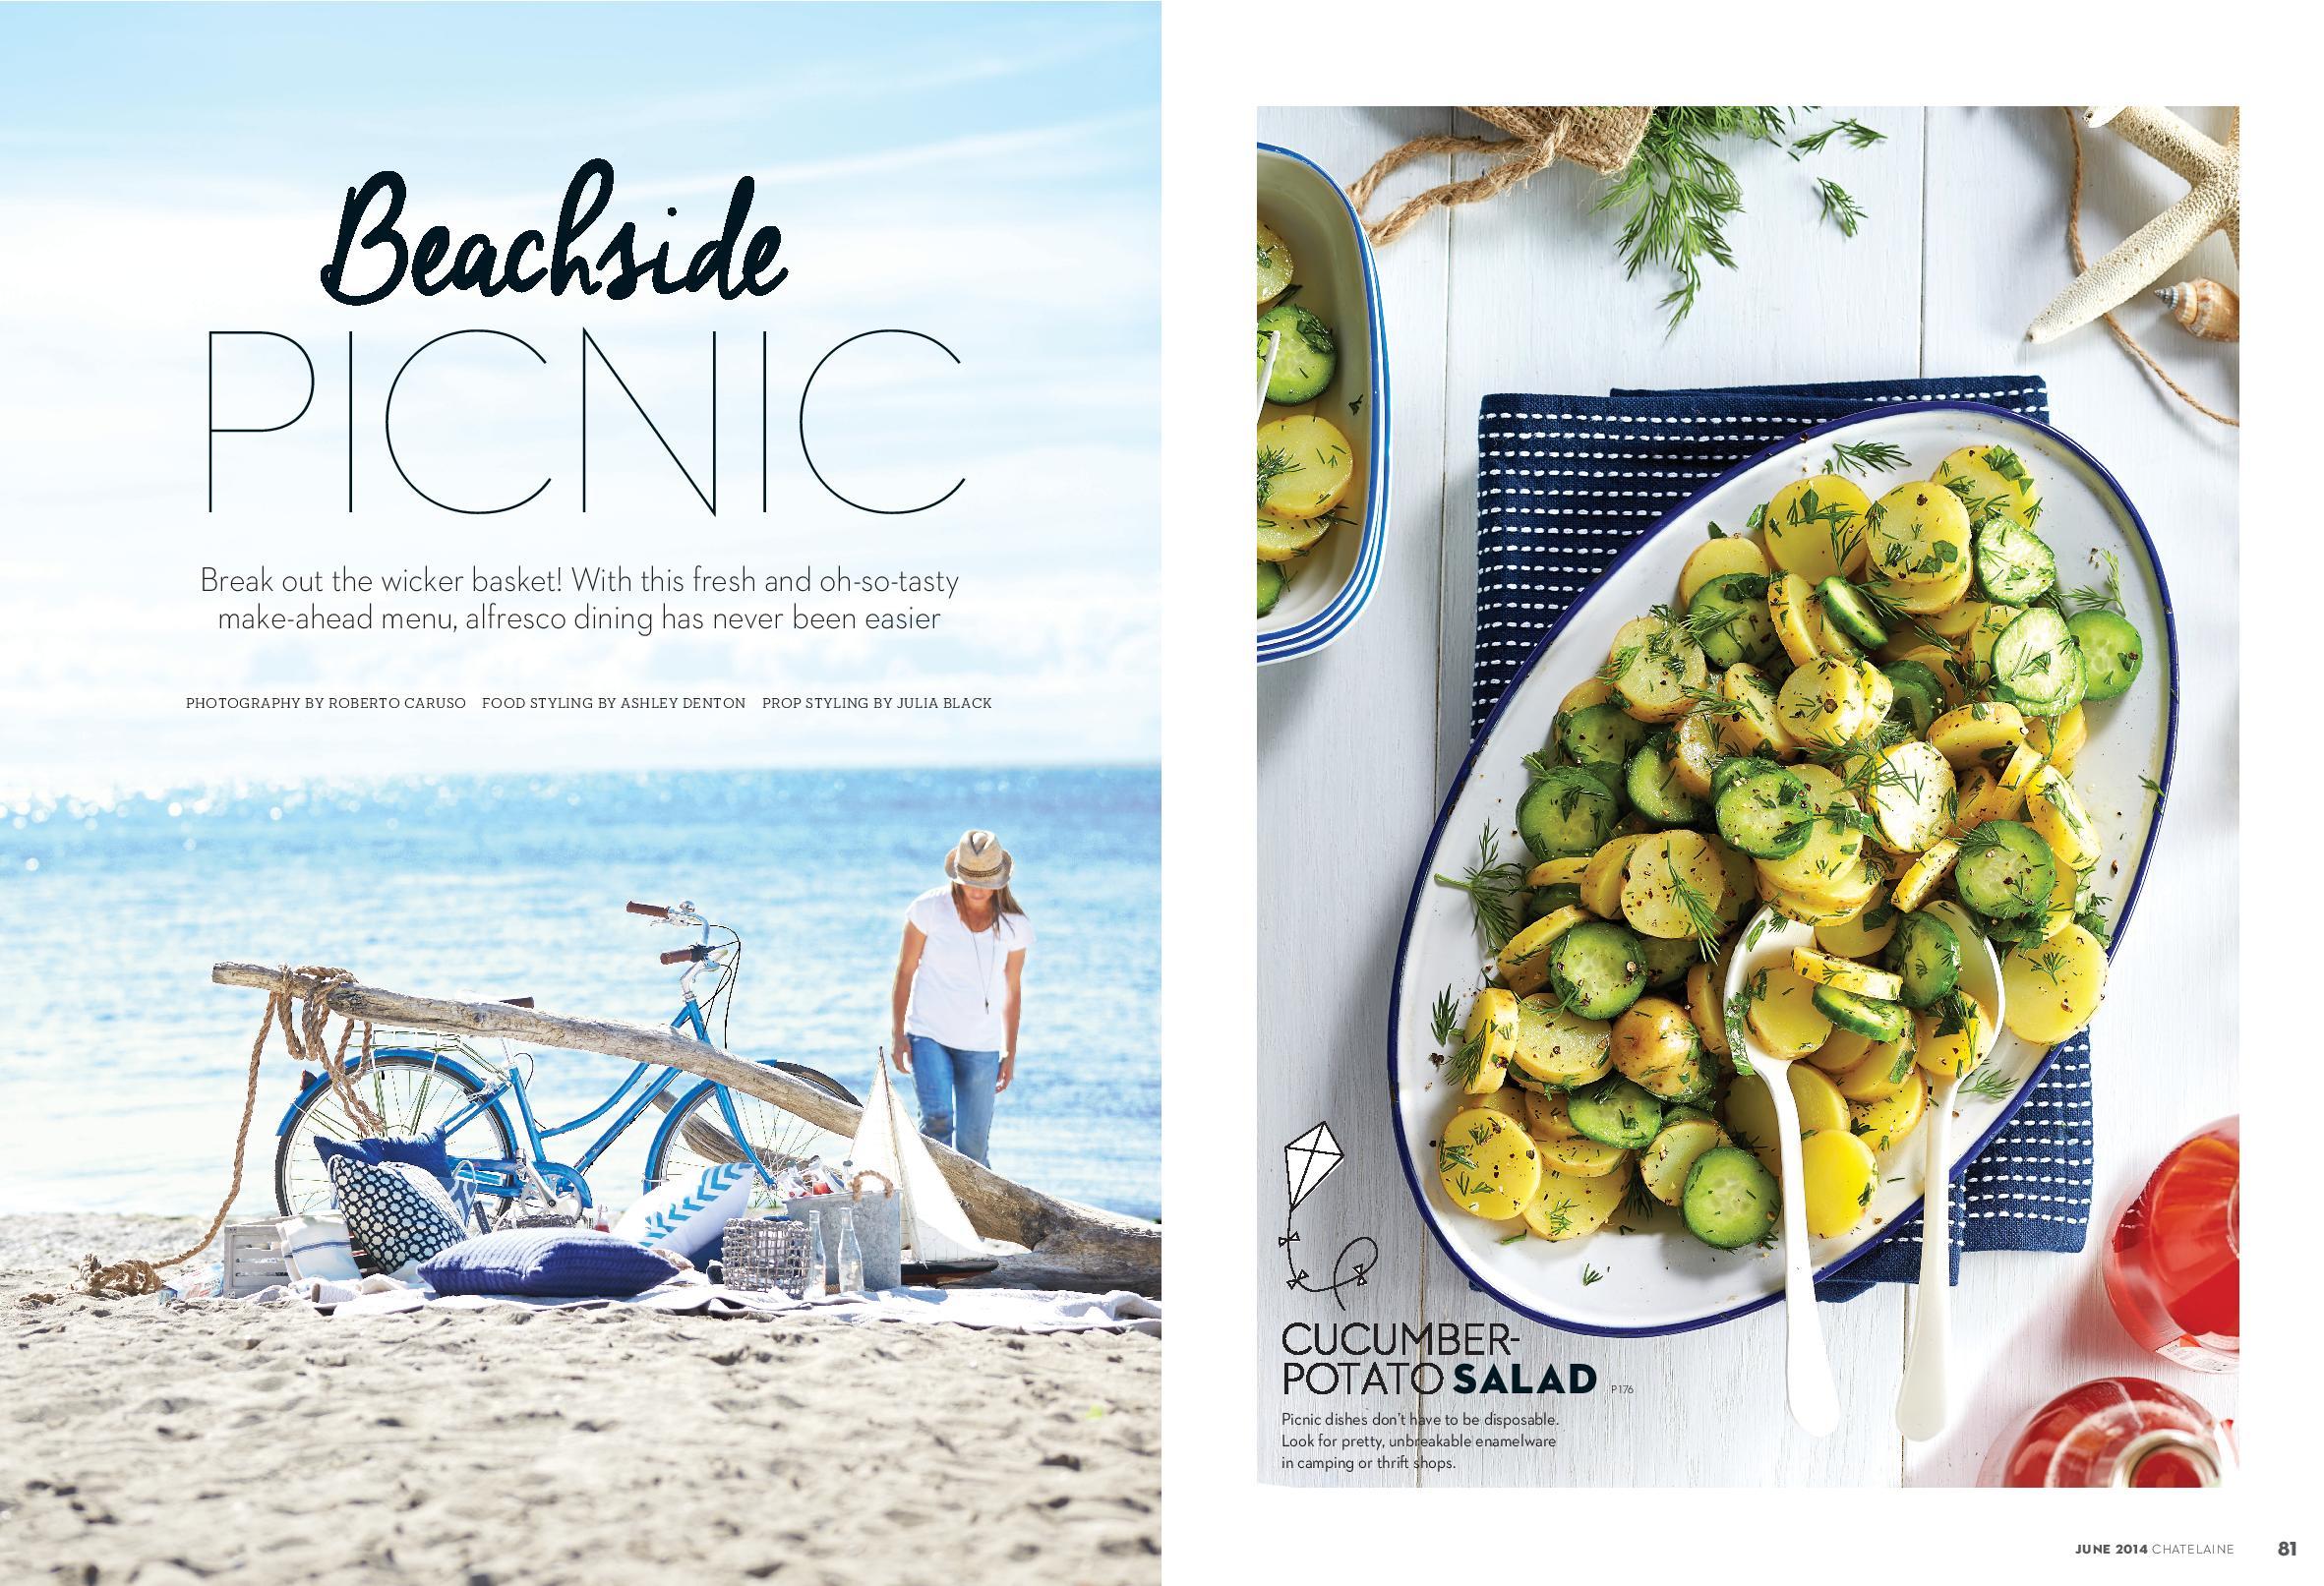 BeachPicnic-page-001.jpg